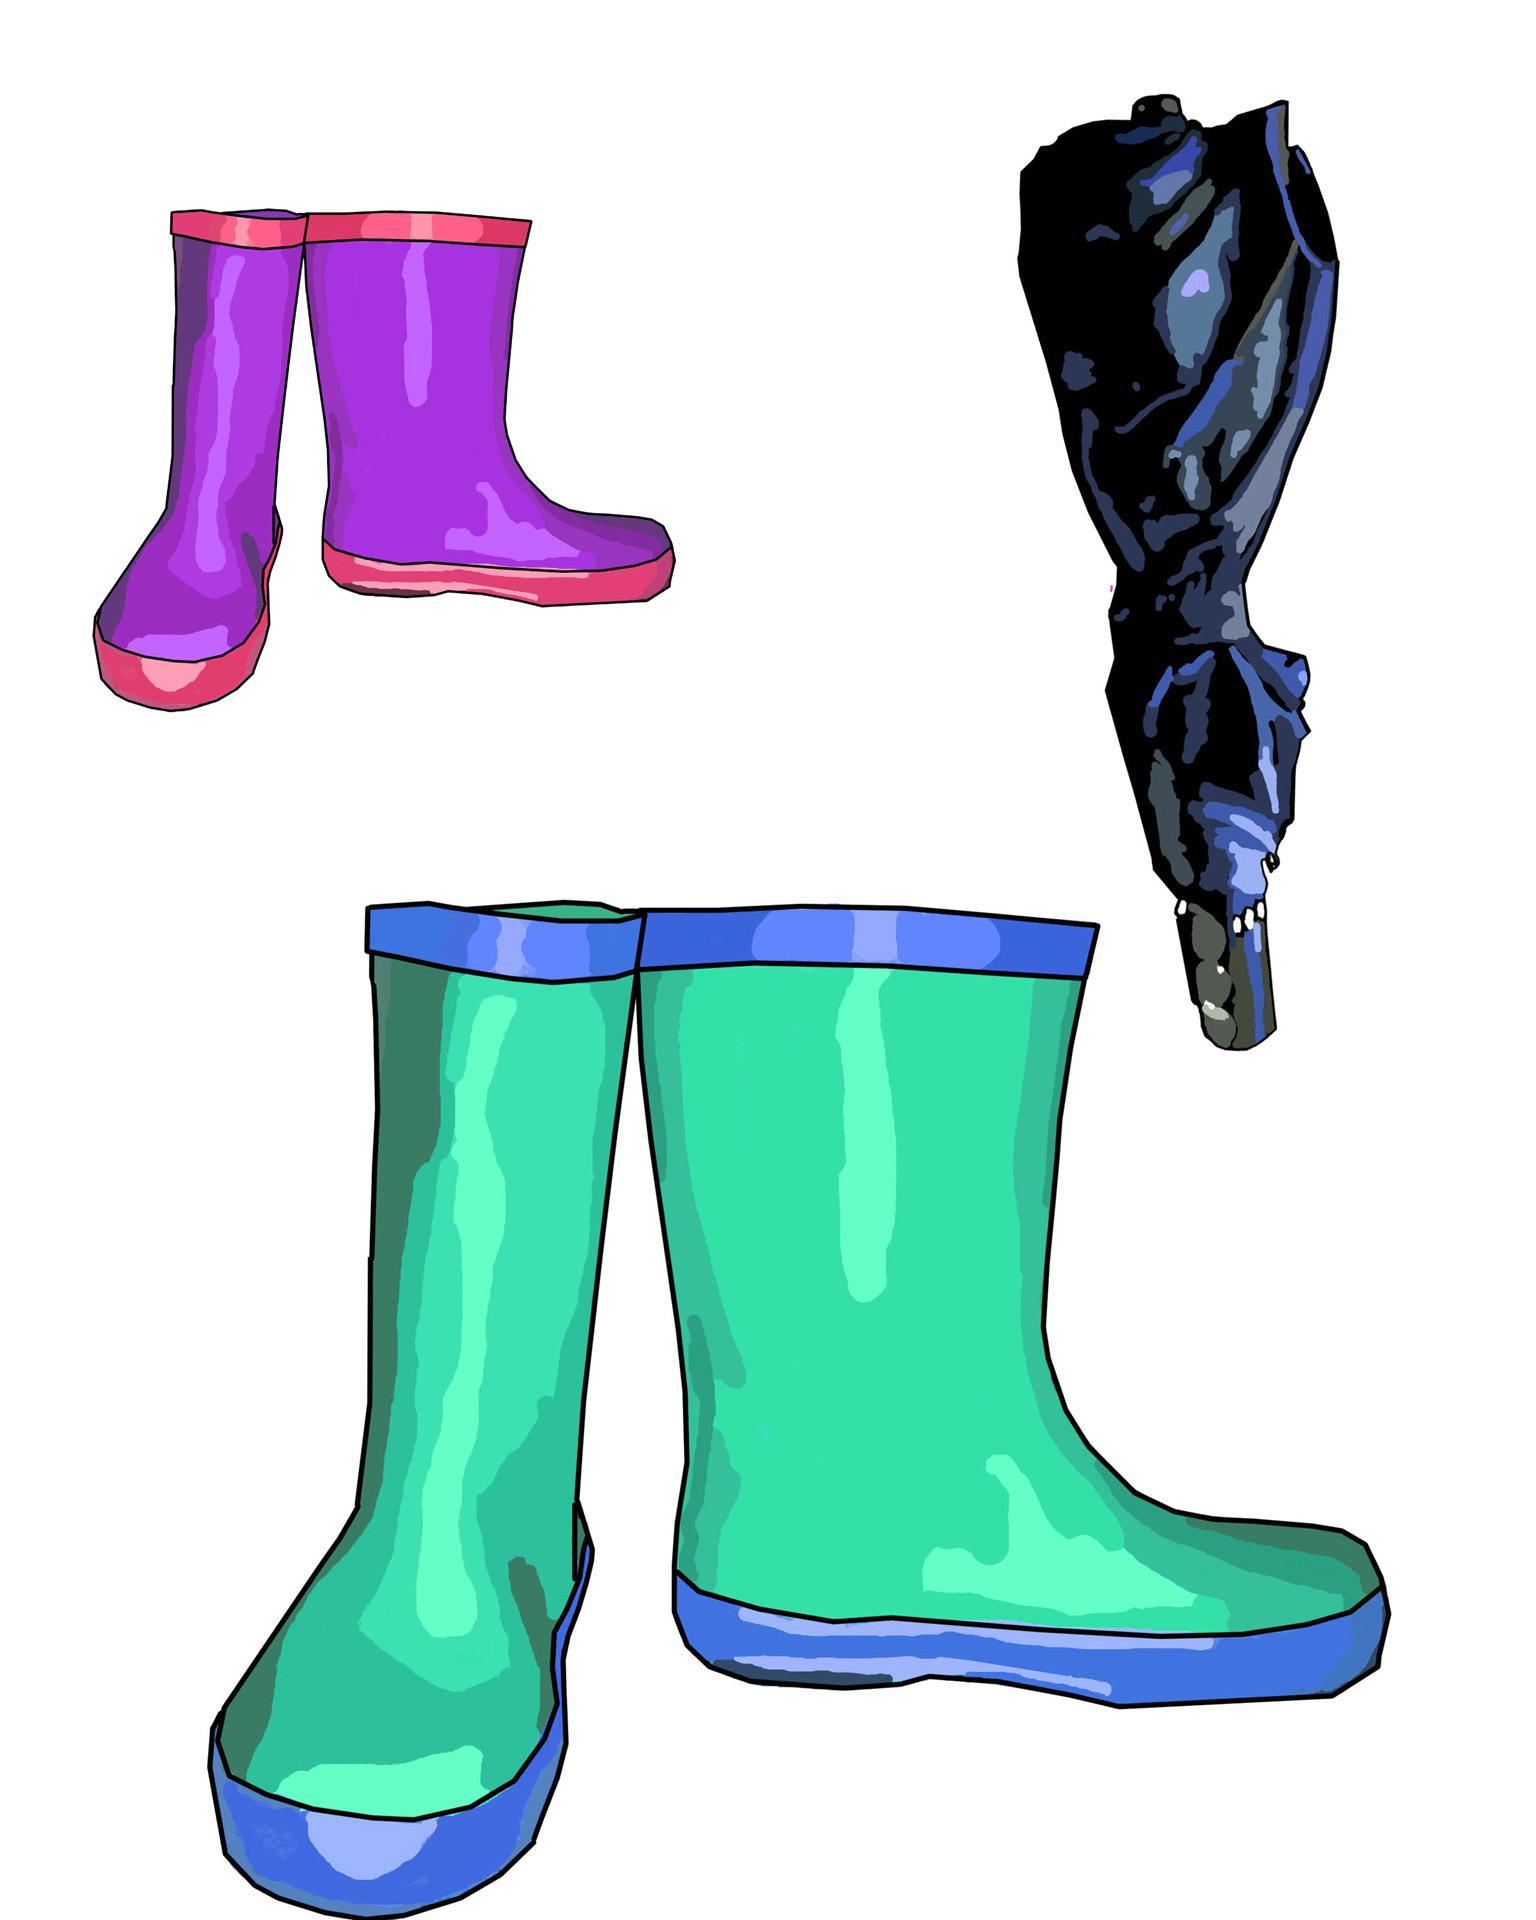 Shoe clipart rainy #10